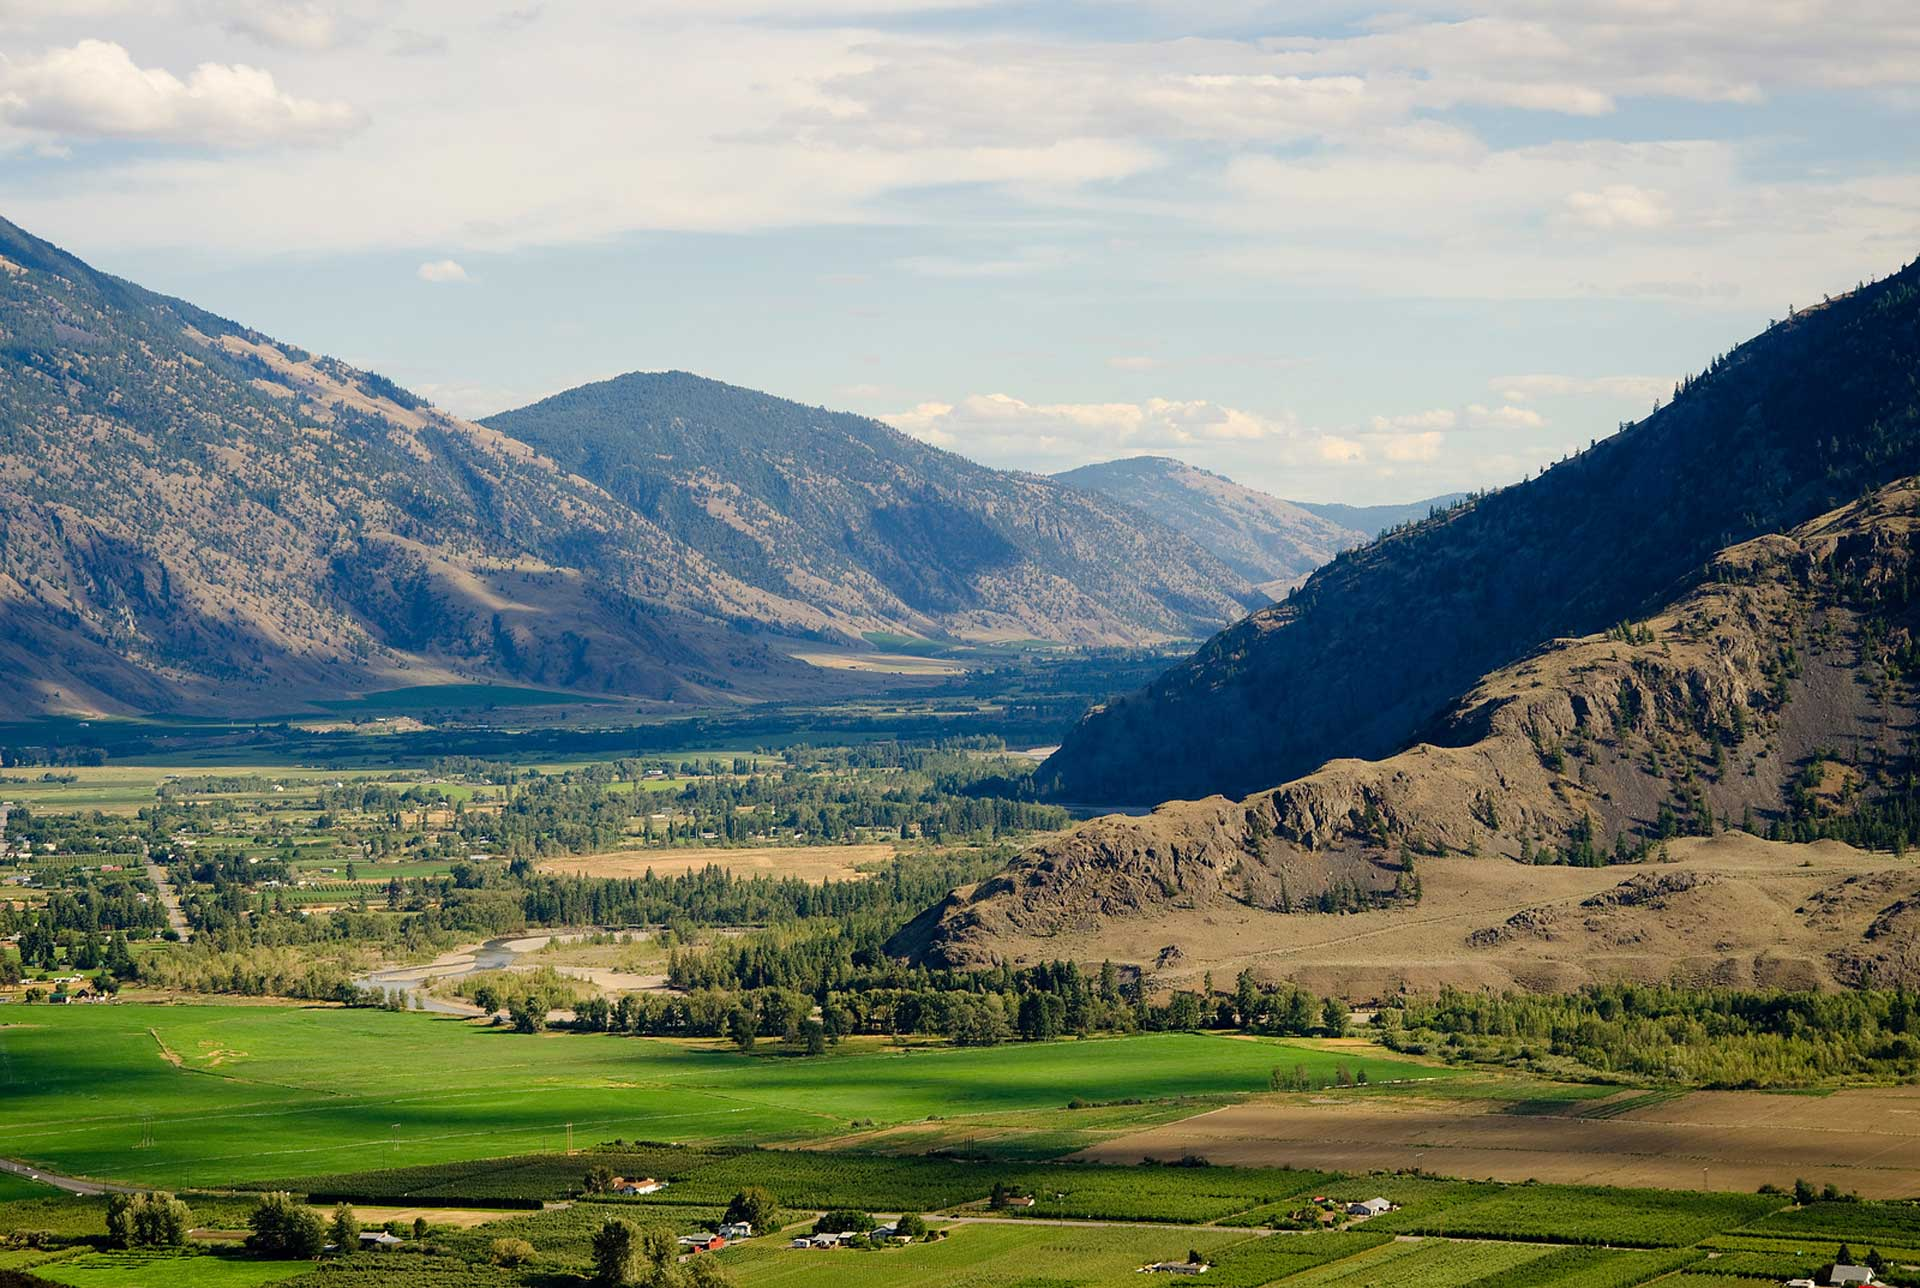 Cawston | Communities | Similkameen Valley, BC, Canada